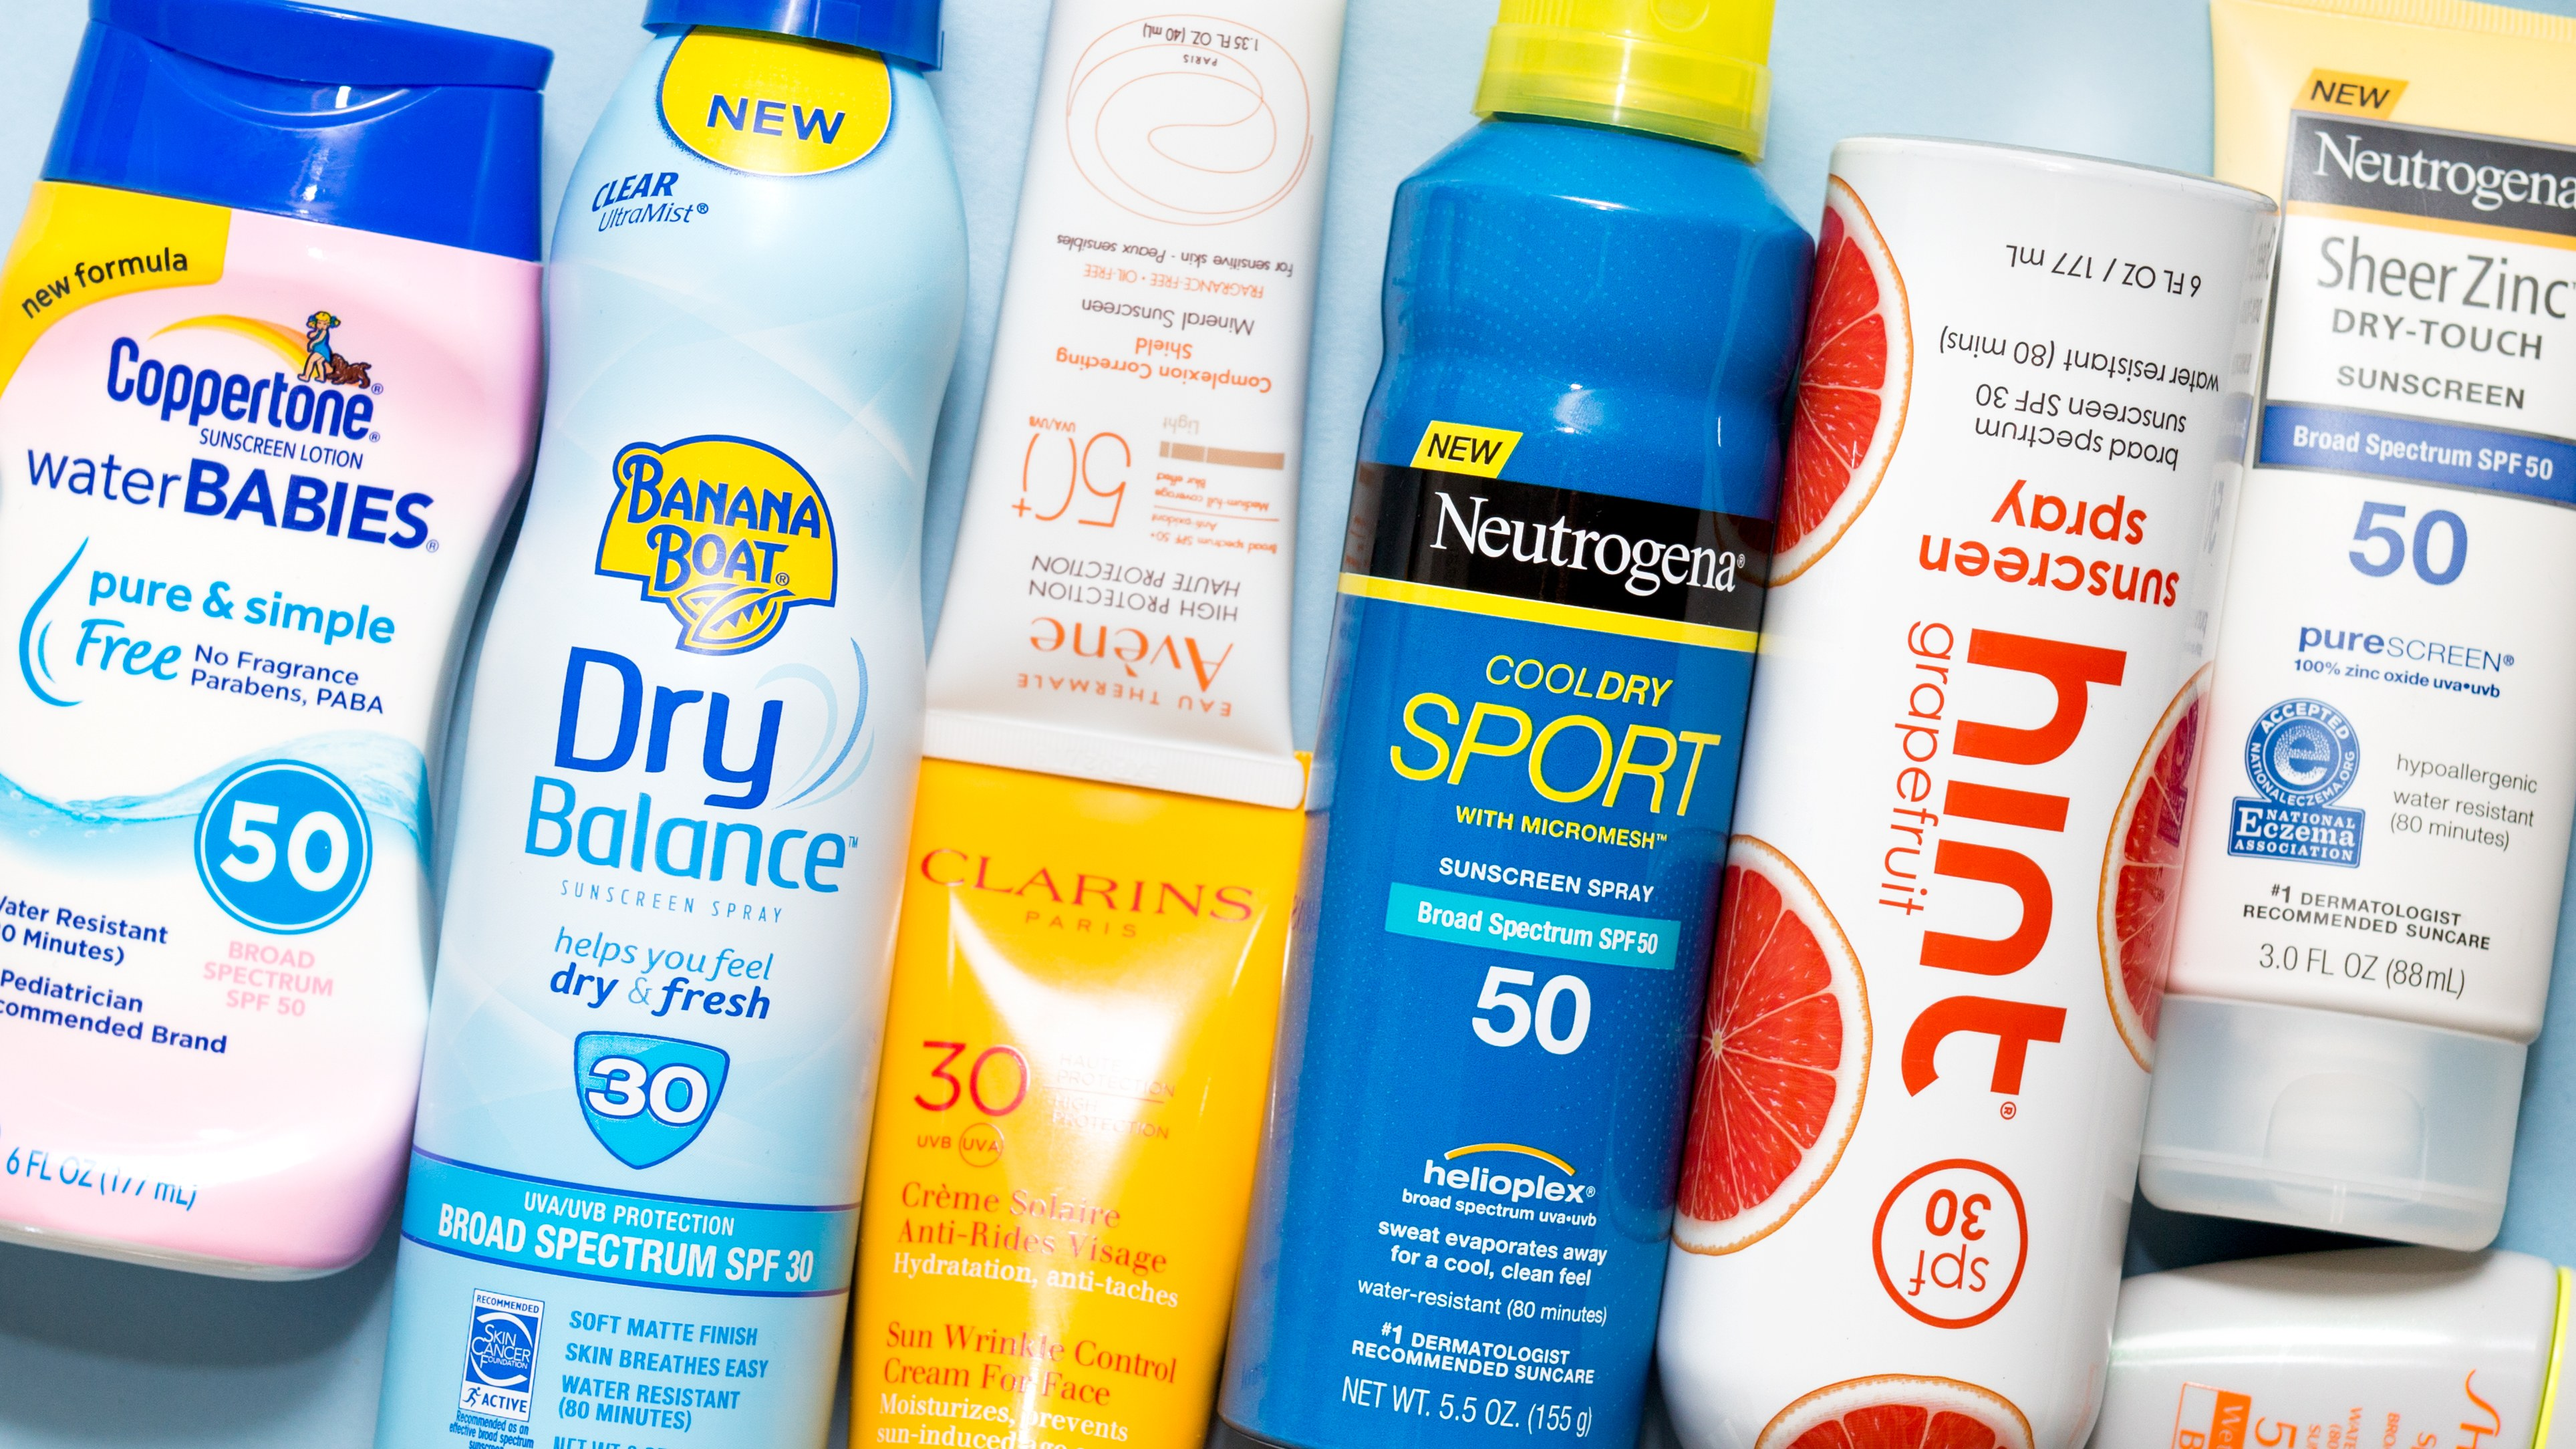 Avoiding the Lobster Look: Sunburns, Sunscreen, and SPF Explained